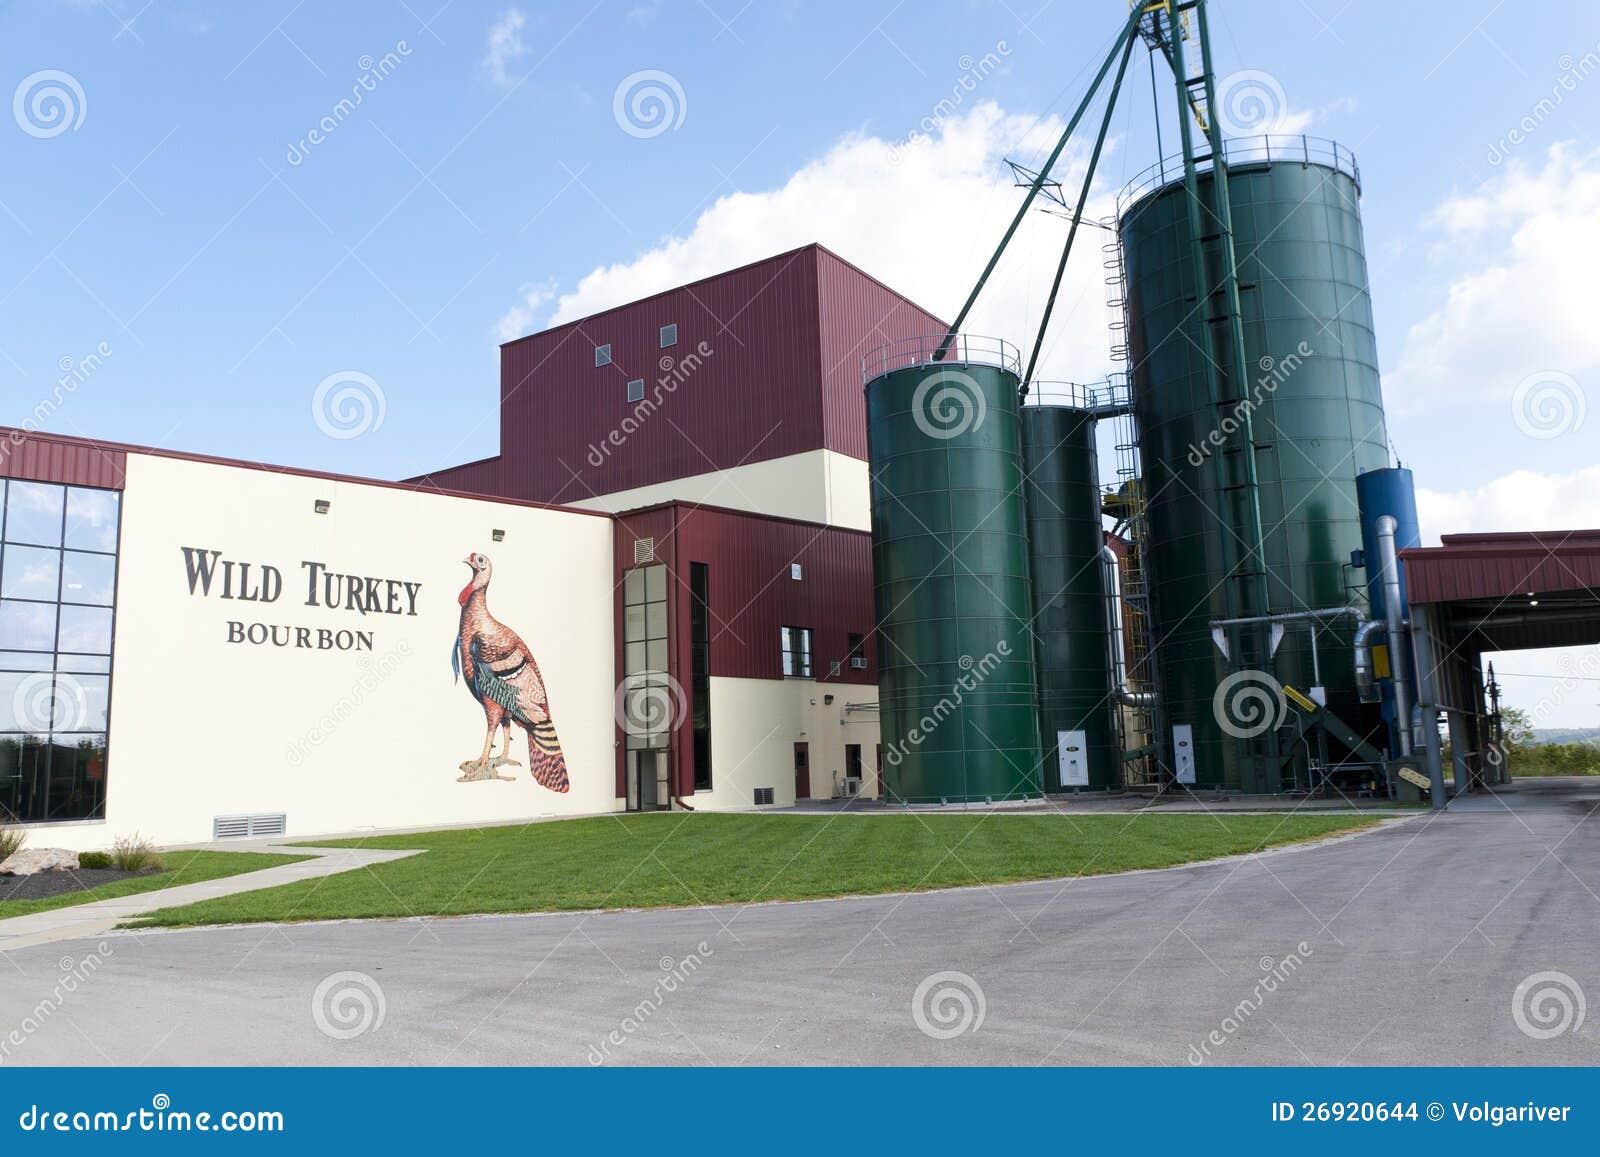 Wild turkey bourbon distillery editorial stock image for Kentucky craft bourbon trail